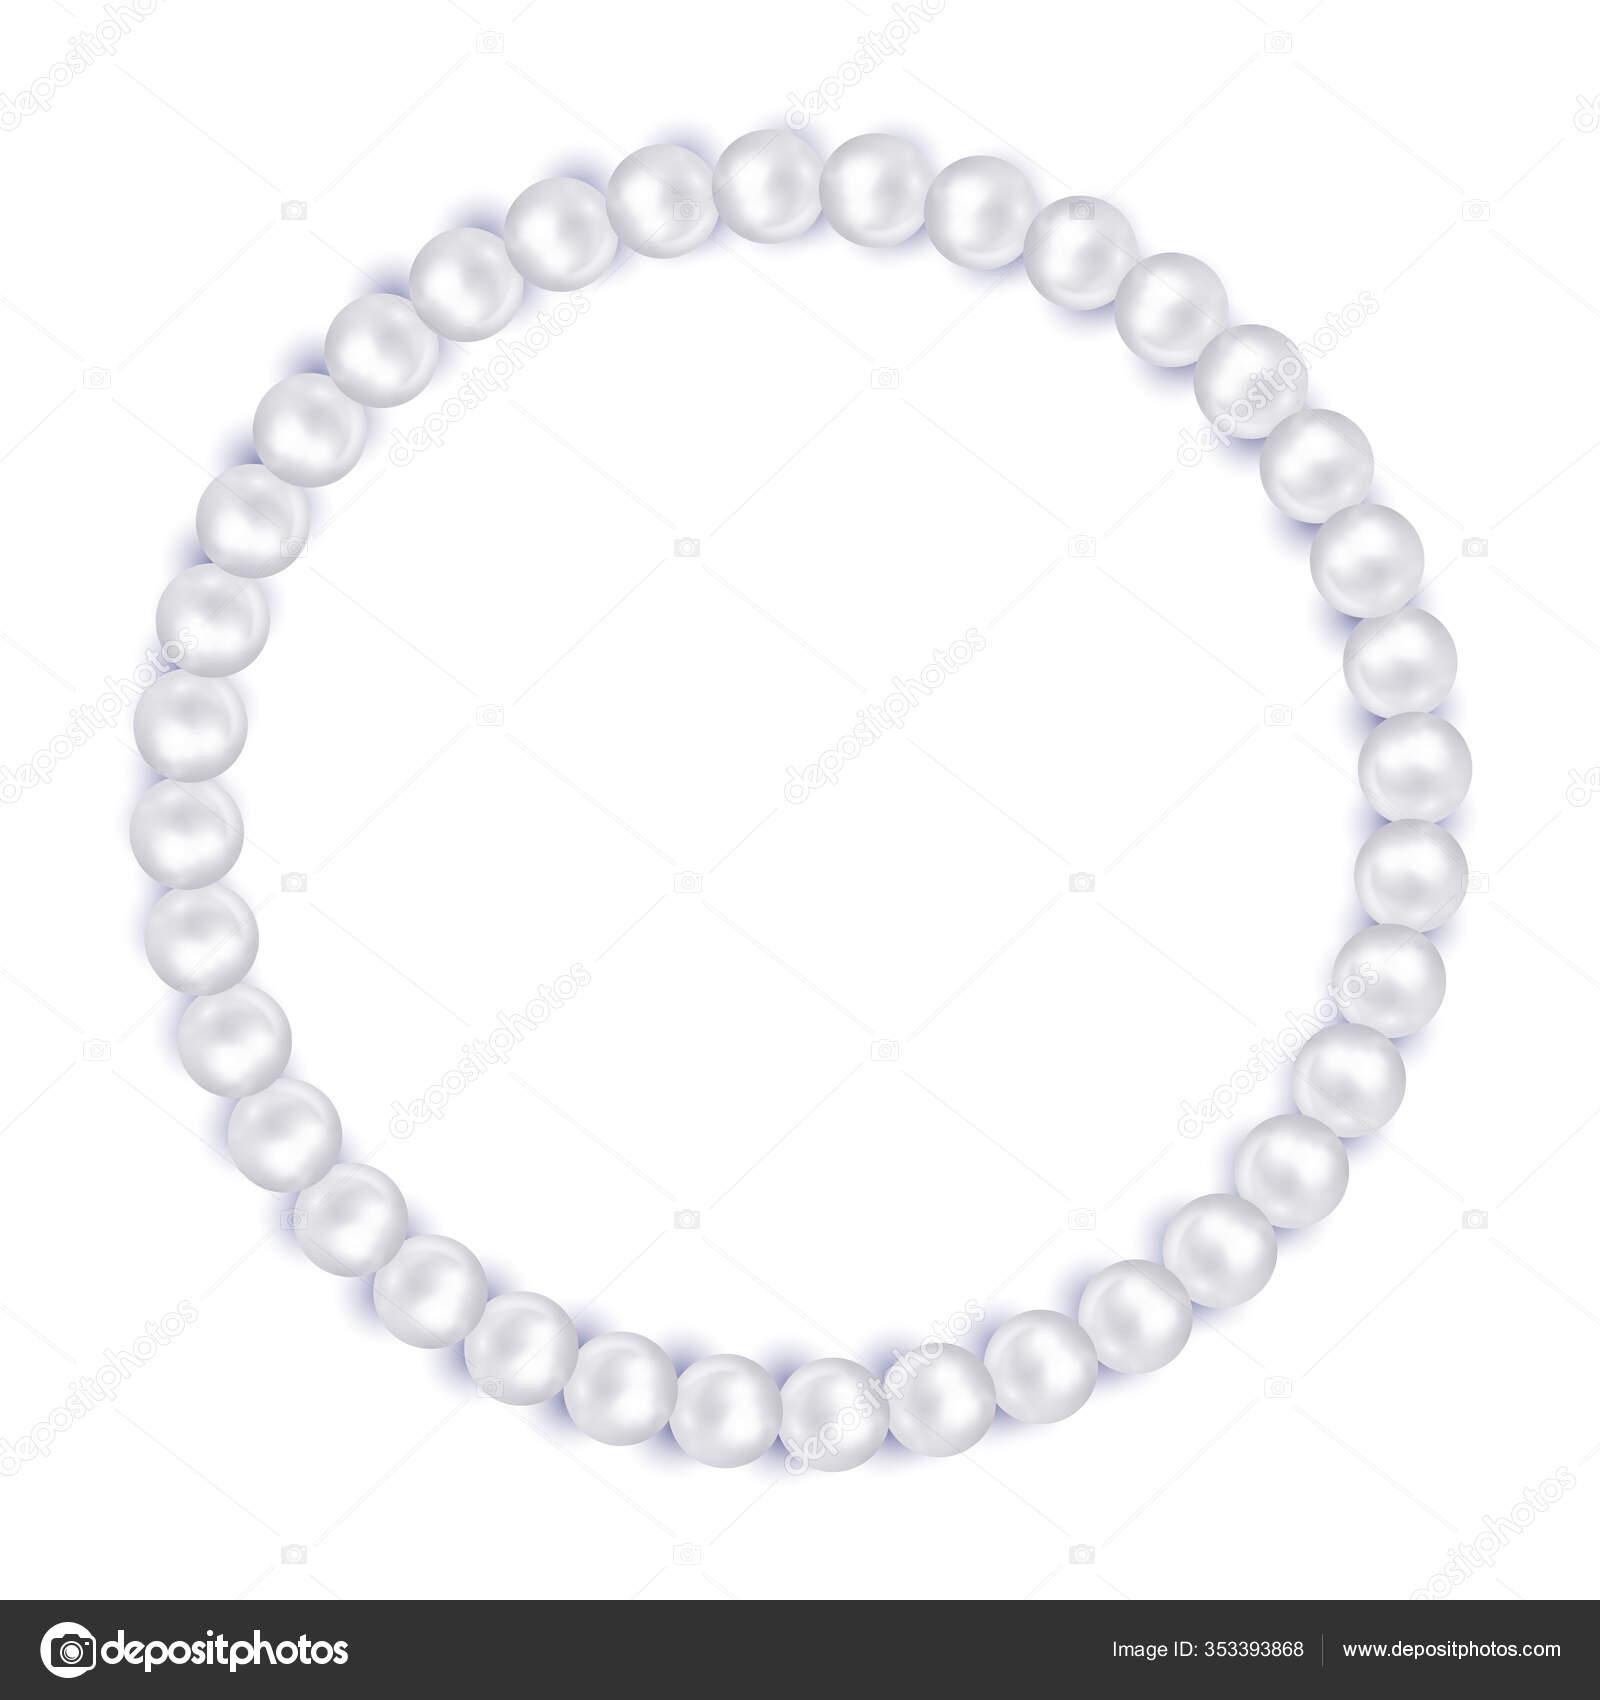 Pearl Necklace Pearl Beads Frame Jewelry Bracelet Necklace Wedding Invitation Vector Image By C Artskvortsova Vector Stock 353393868